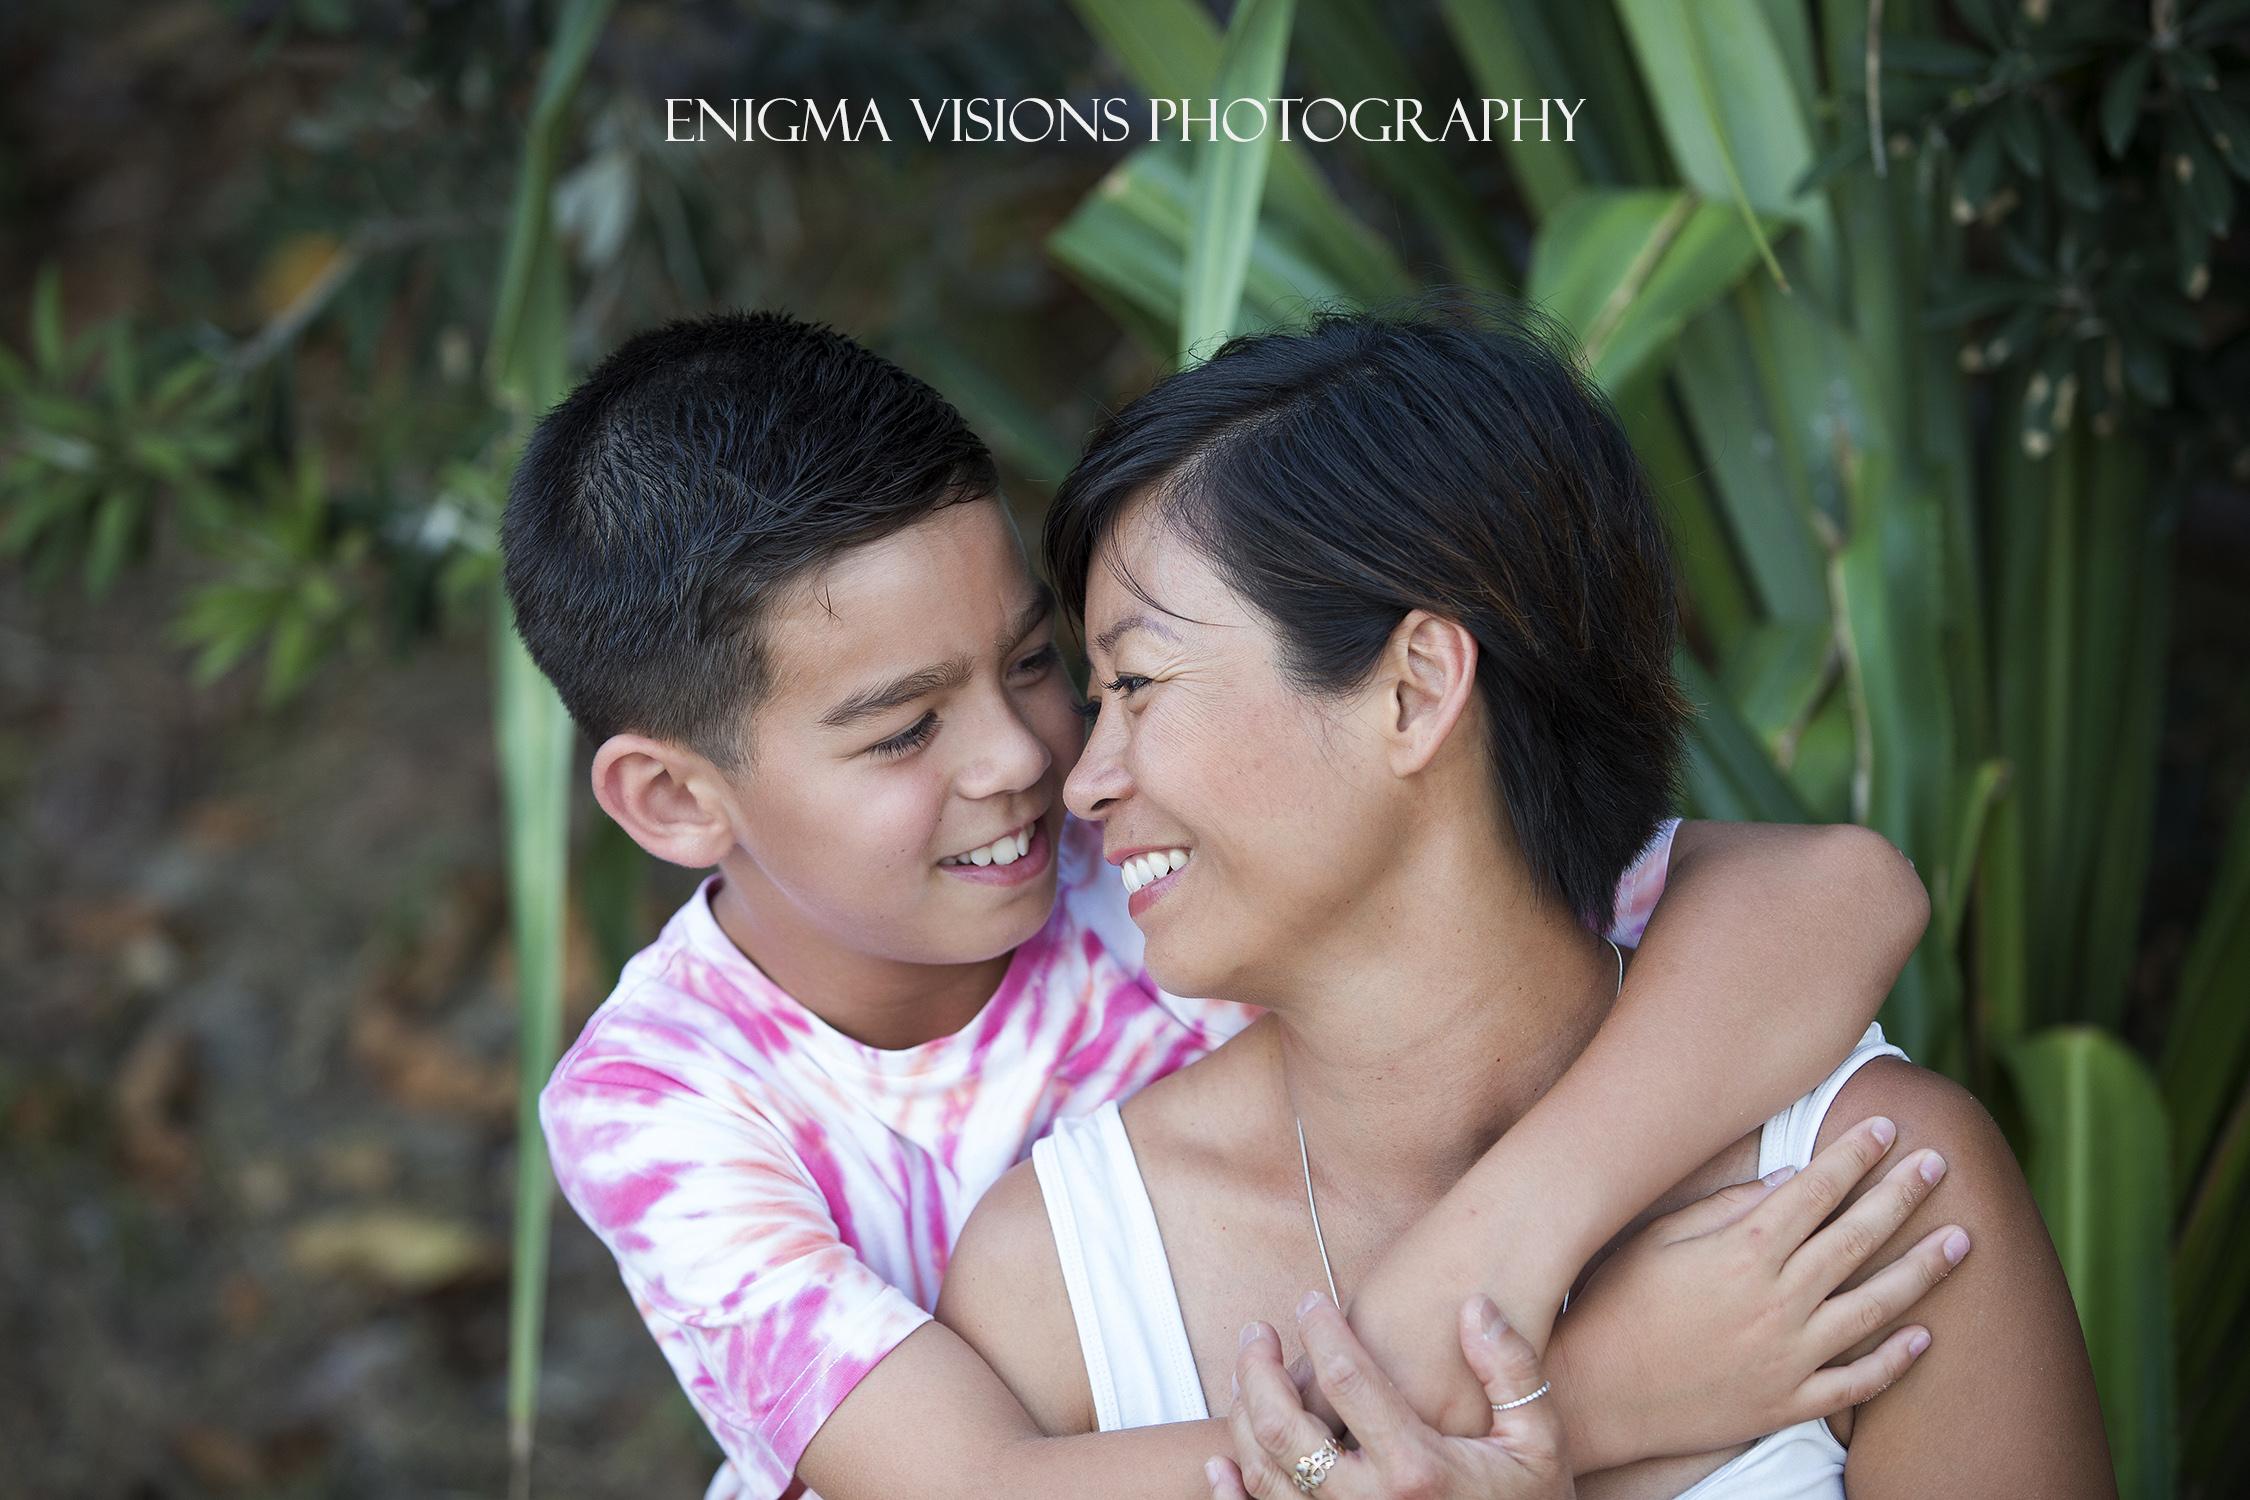 EnigmaVisionsPhotography_FAMILY_Sarah (8).jpg